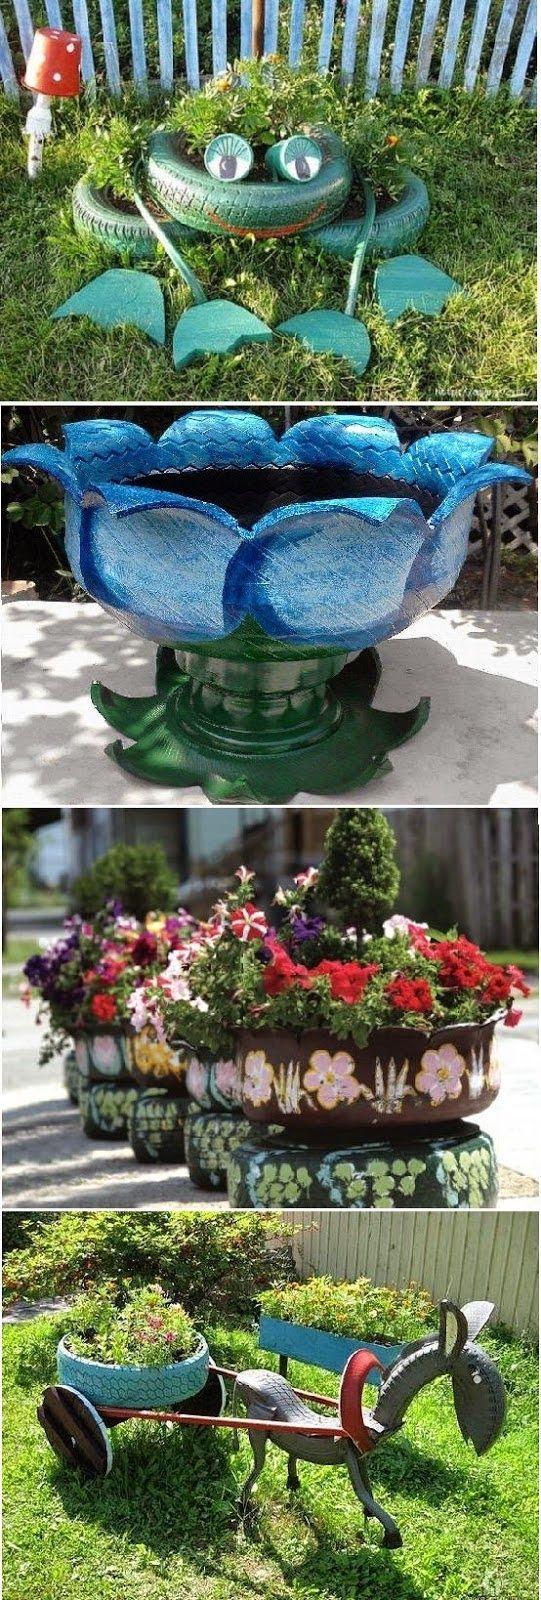 The 25 best garden ideas using old tires ideas on pinterest garden ideas using tires diy - Garden ideas using old tires ...